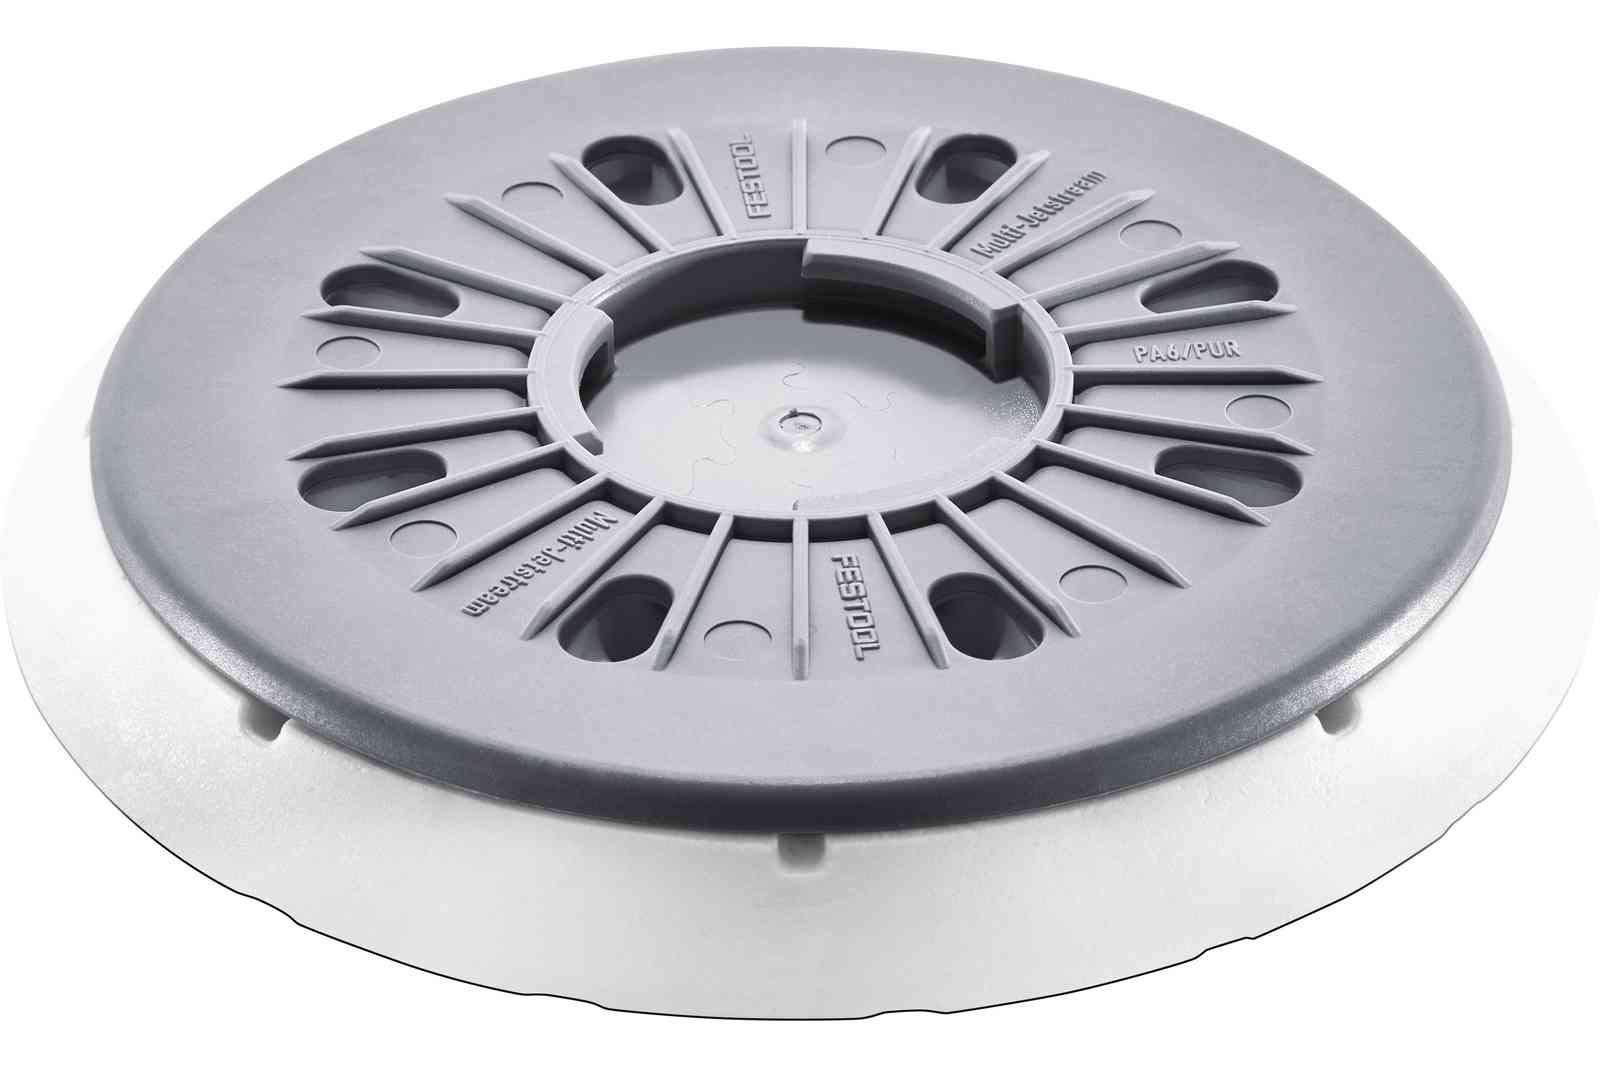 Festool 202462 RO 150 Ultra-Soft Sanding Pad by Festool